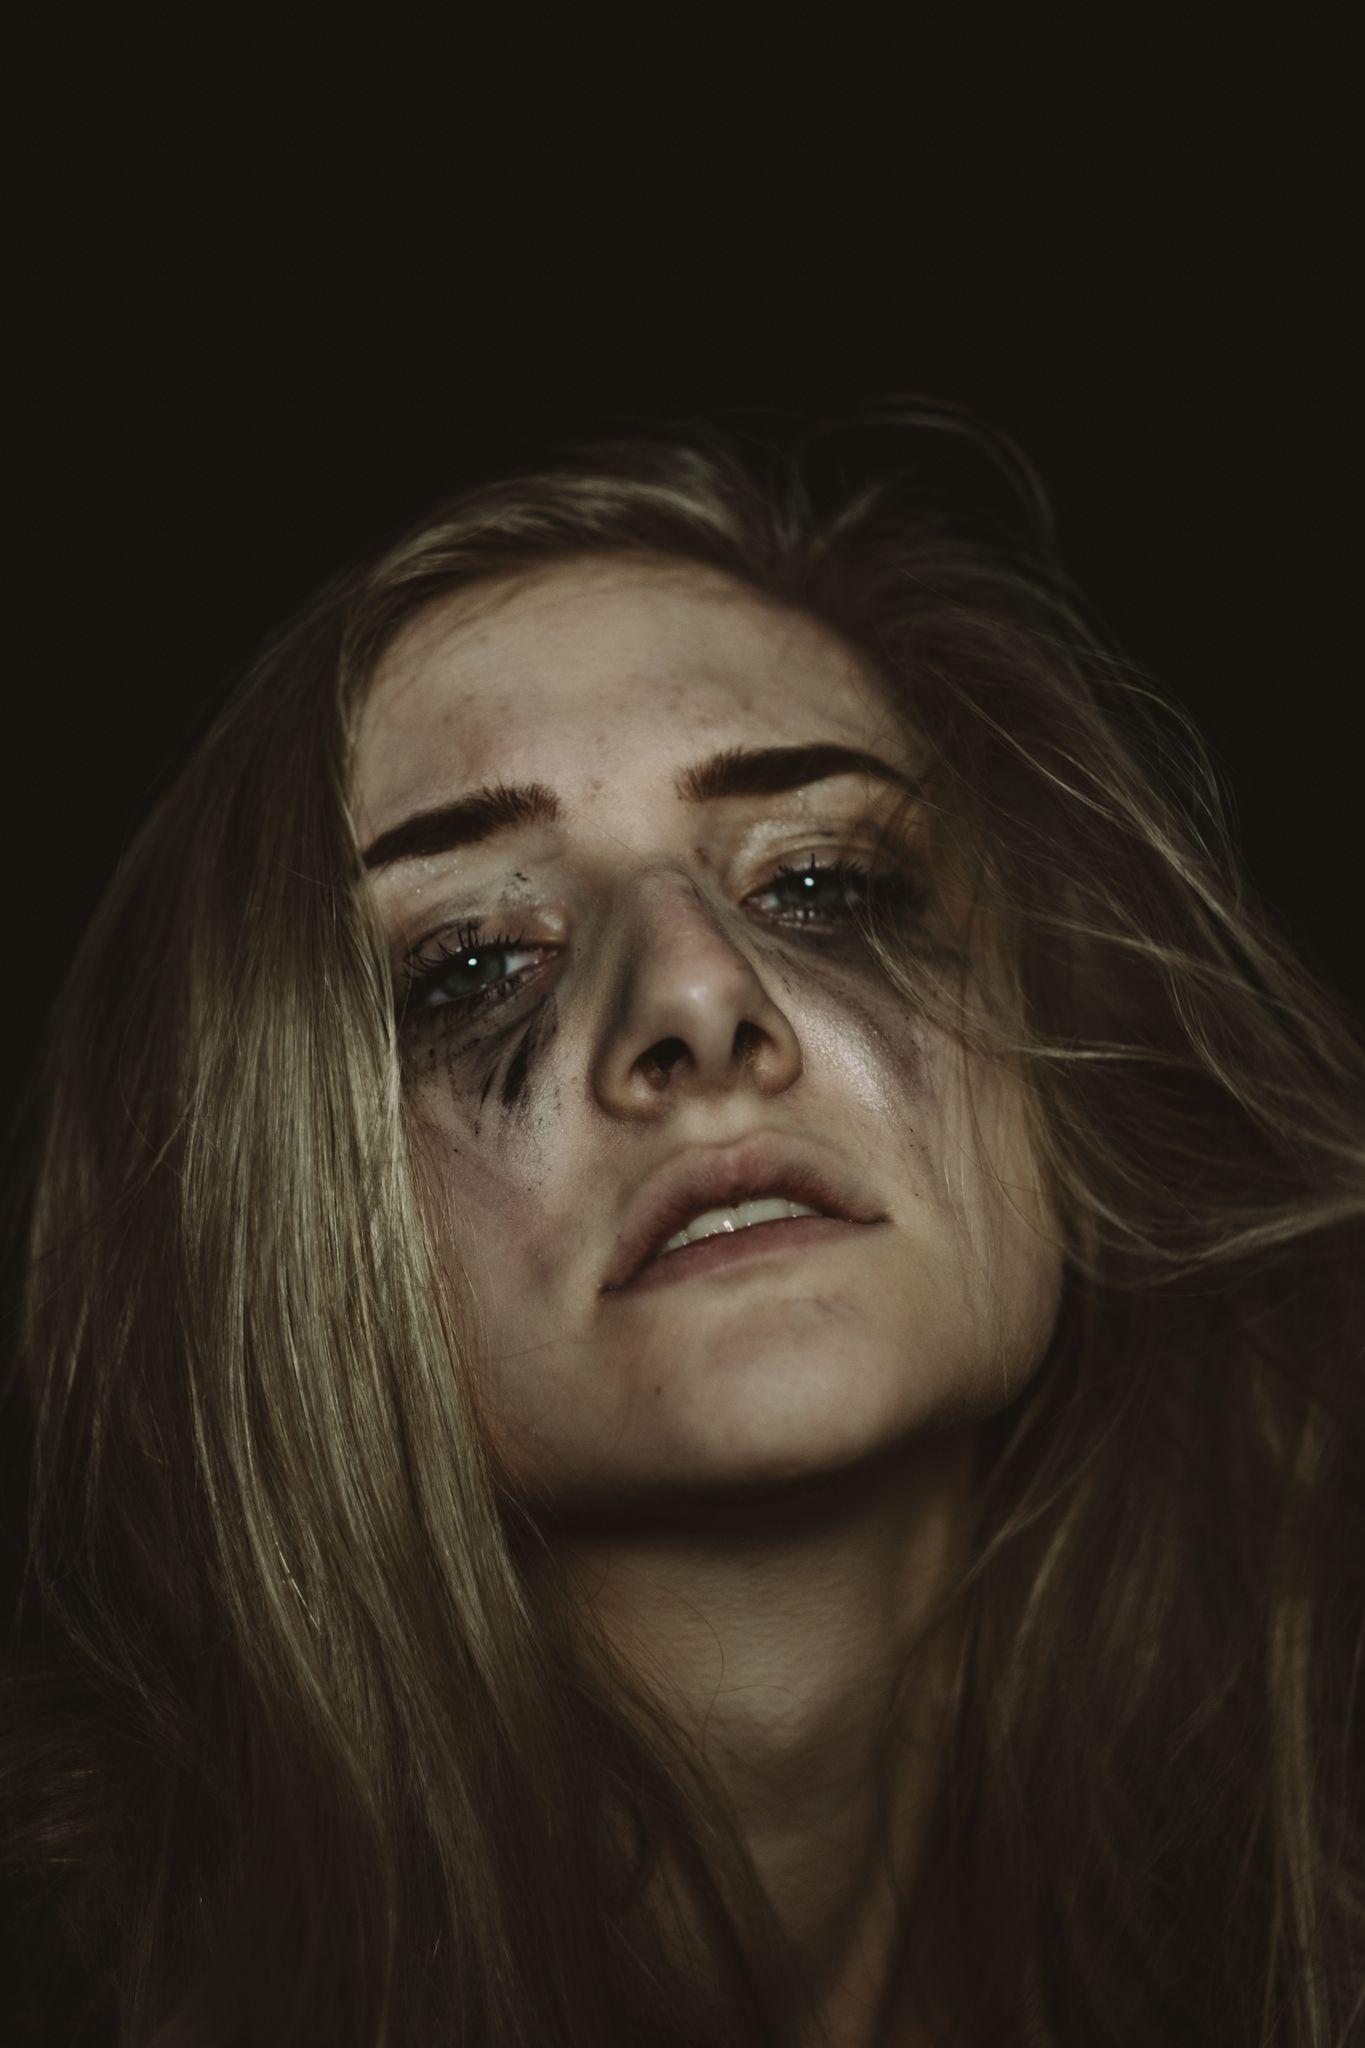 Sadness frustration senior girl portrait dark lxc loaf looks like film evan woods jessica whitaker andrew kearns photography portrait